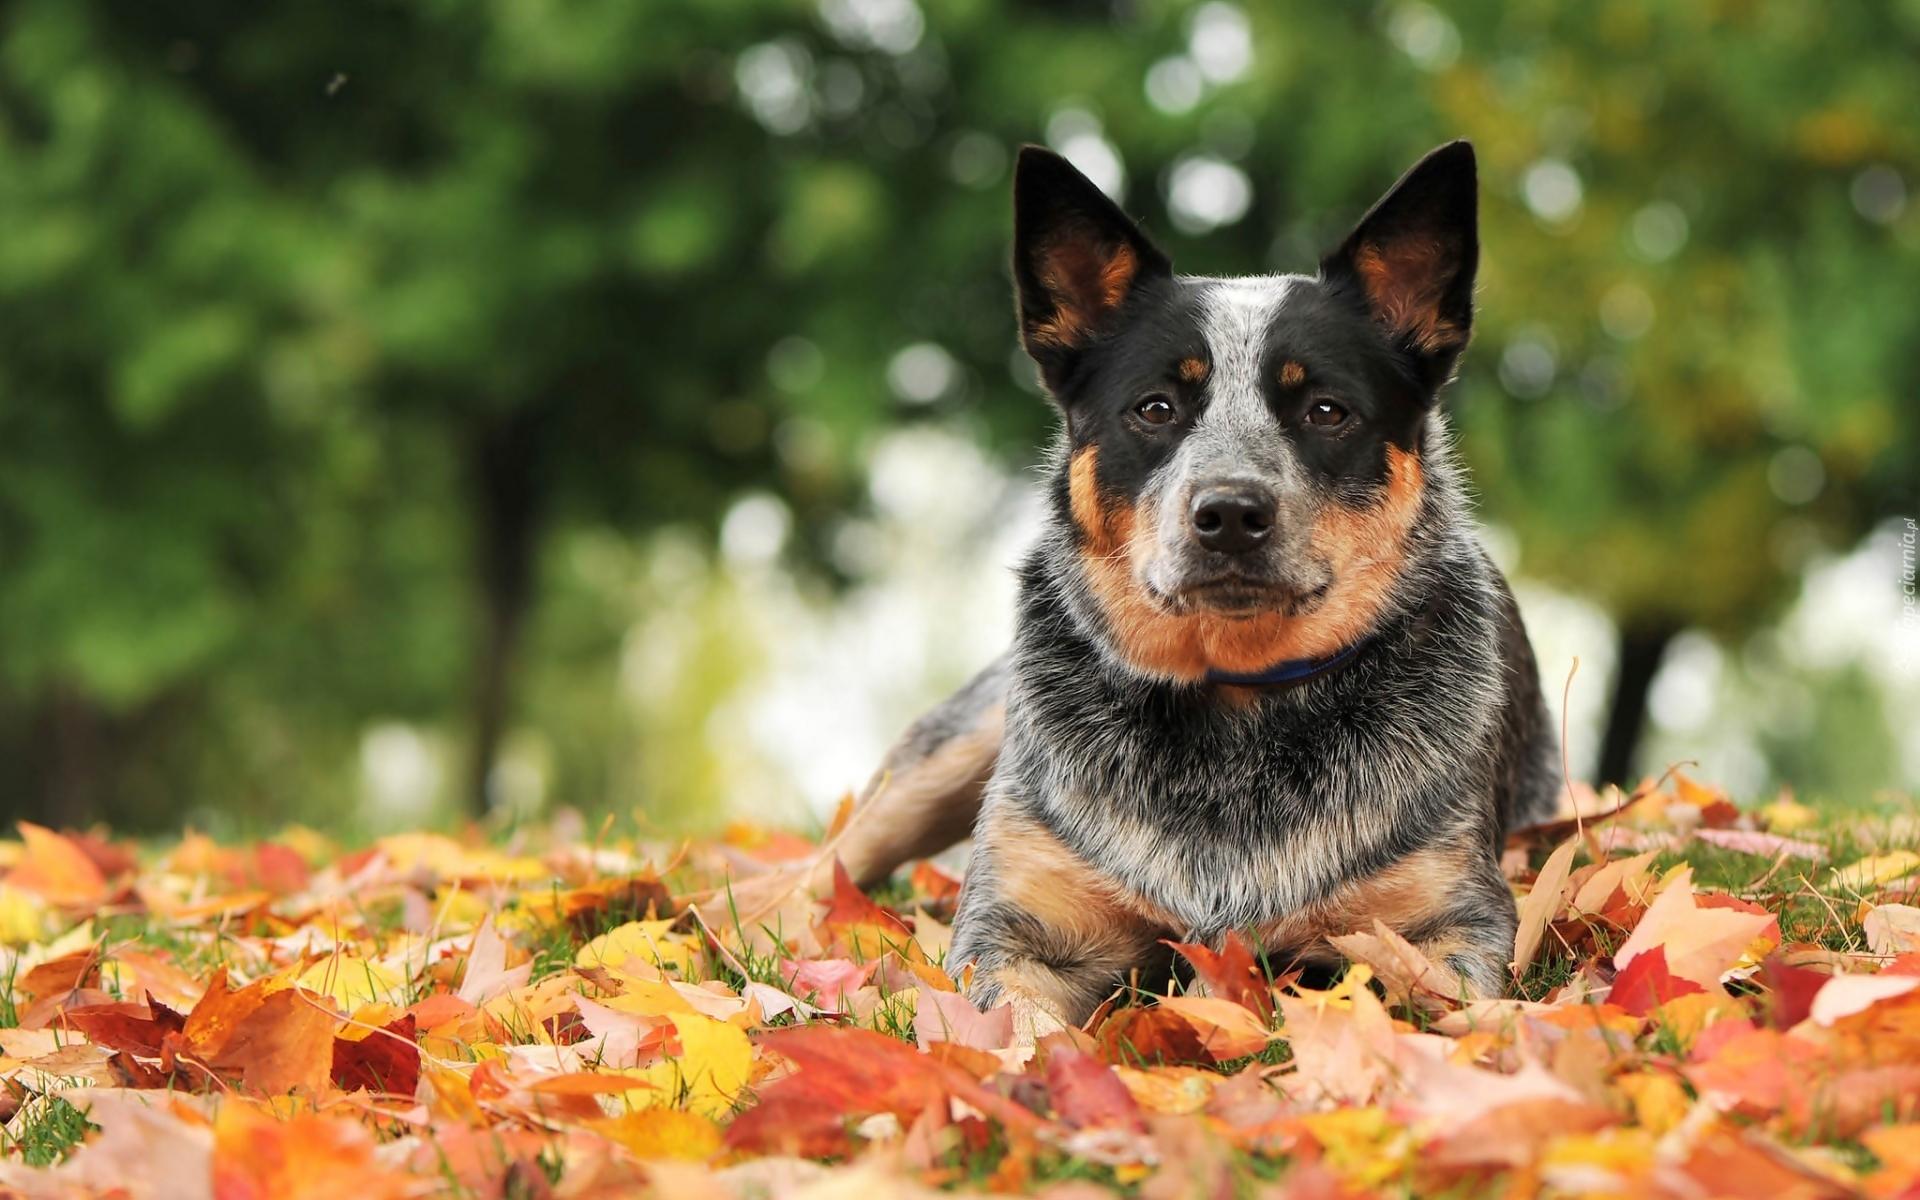 Cute Chihuahua Puppies Wallpaper Australijski Pies Pasterski Australian Cattle Dog